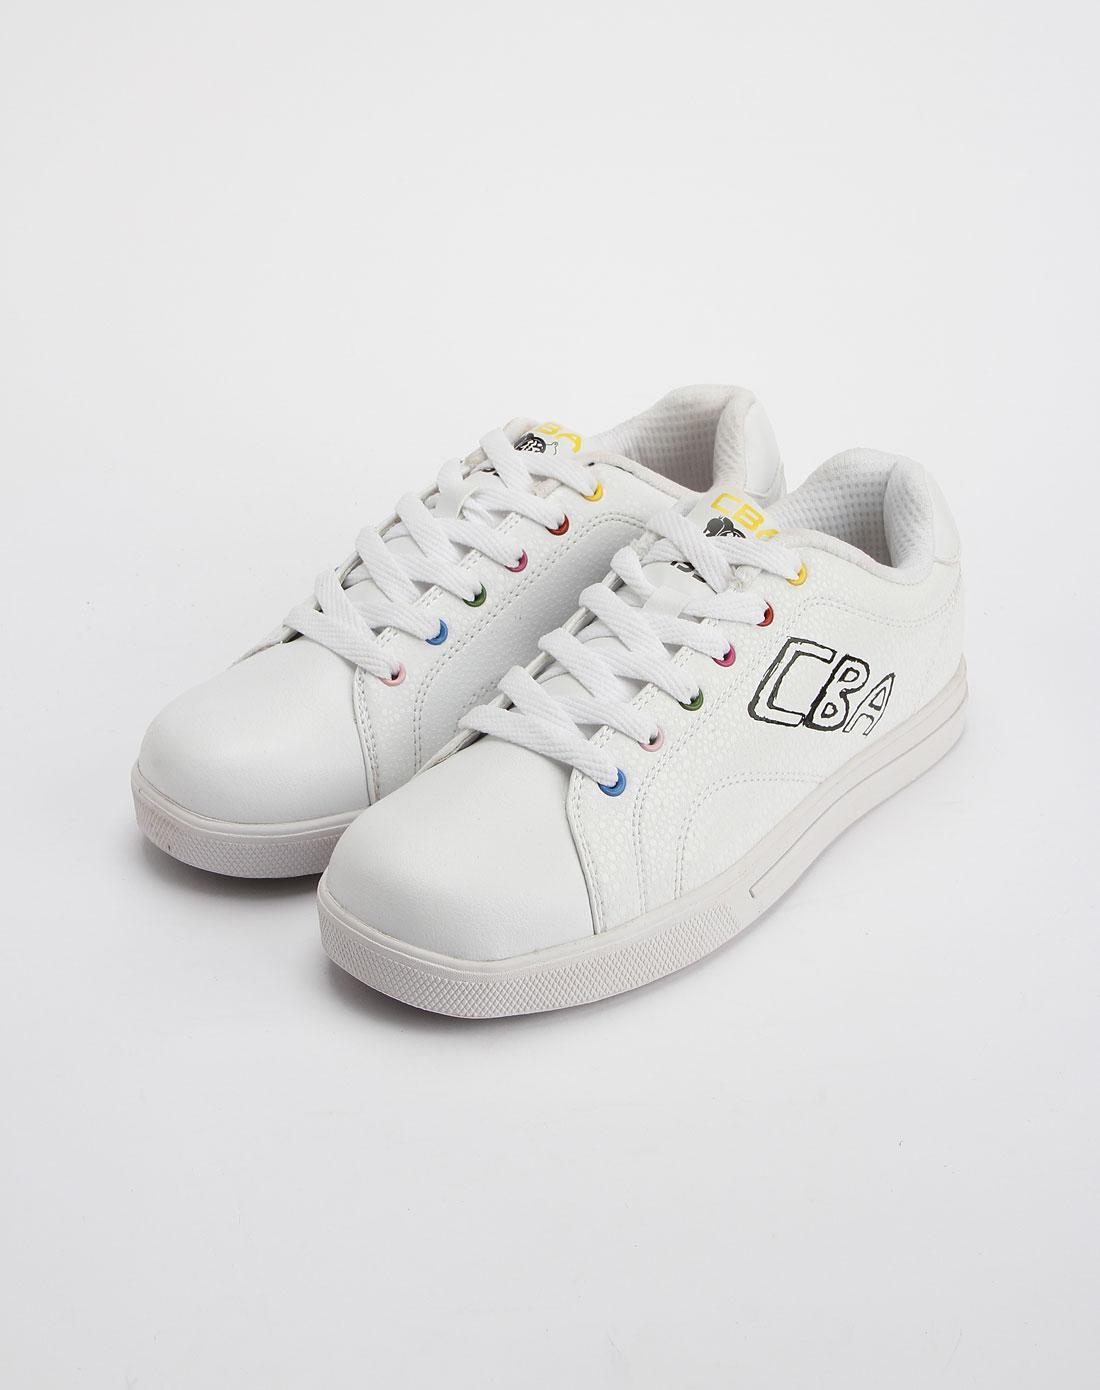 cba女款白/黑色时尚运动板鞋2021314-002